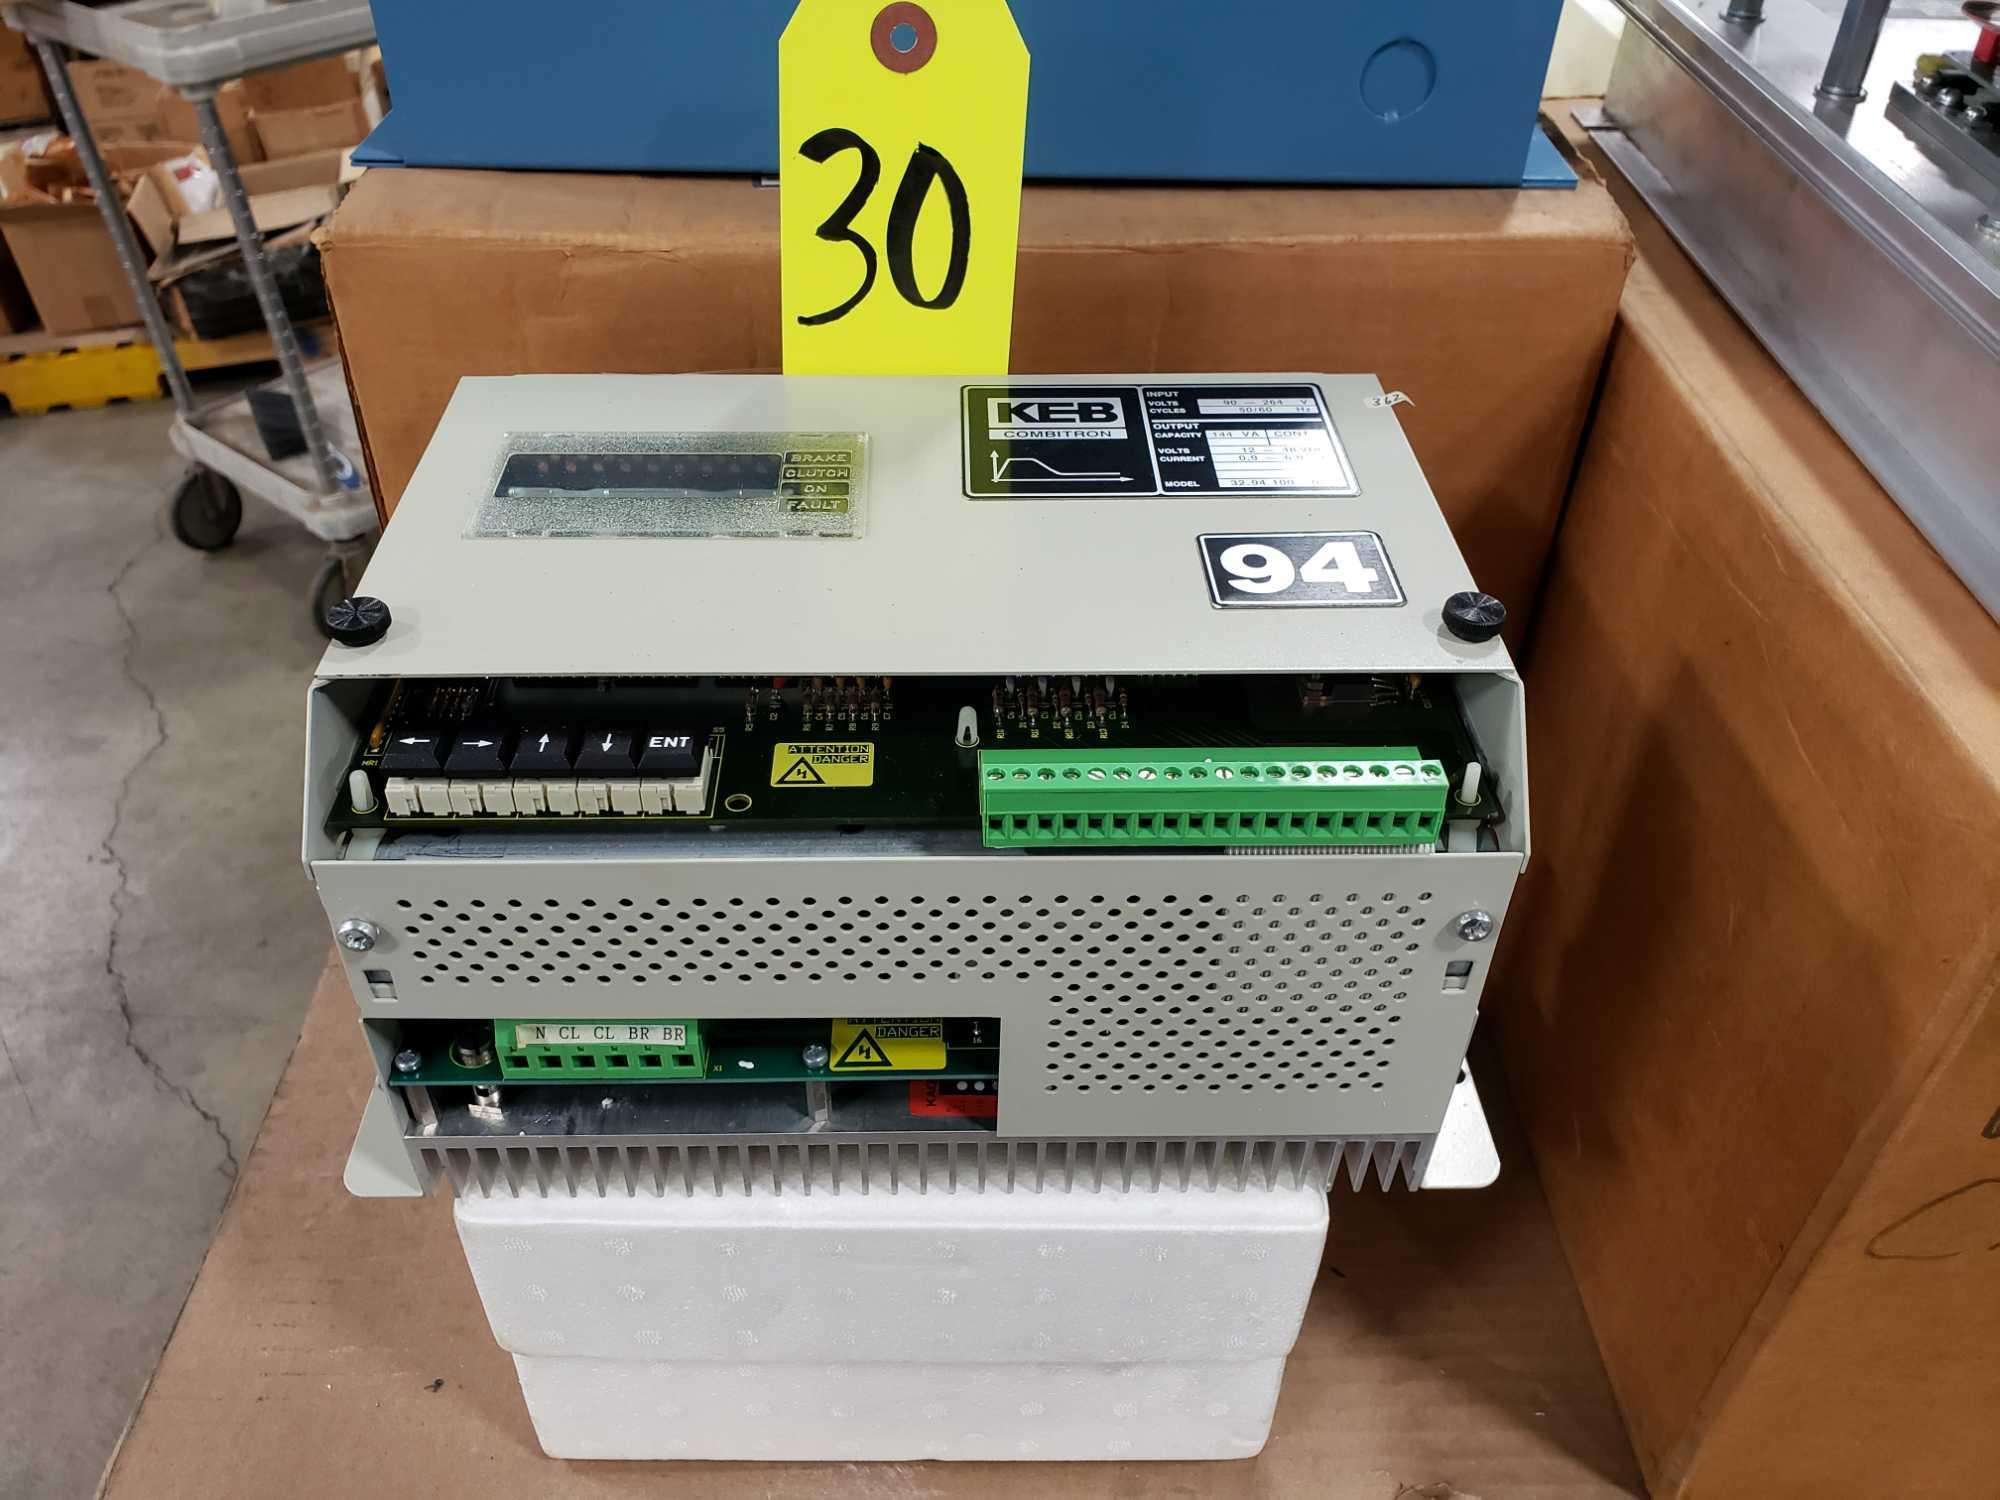 KEB Combitron drive model 32.94.100-0728, 90-264v input, 12-48vdc volt output. New as pictured.